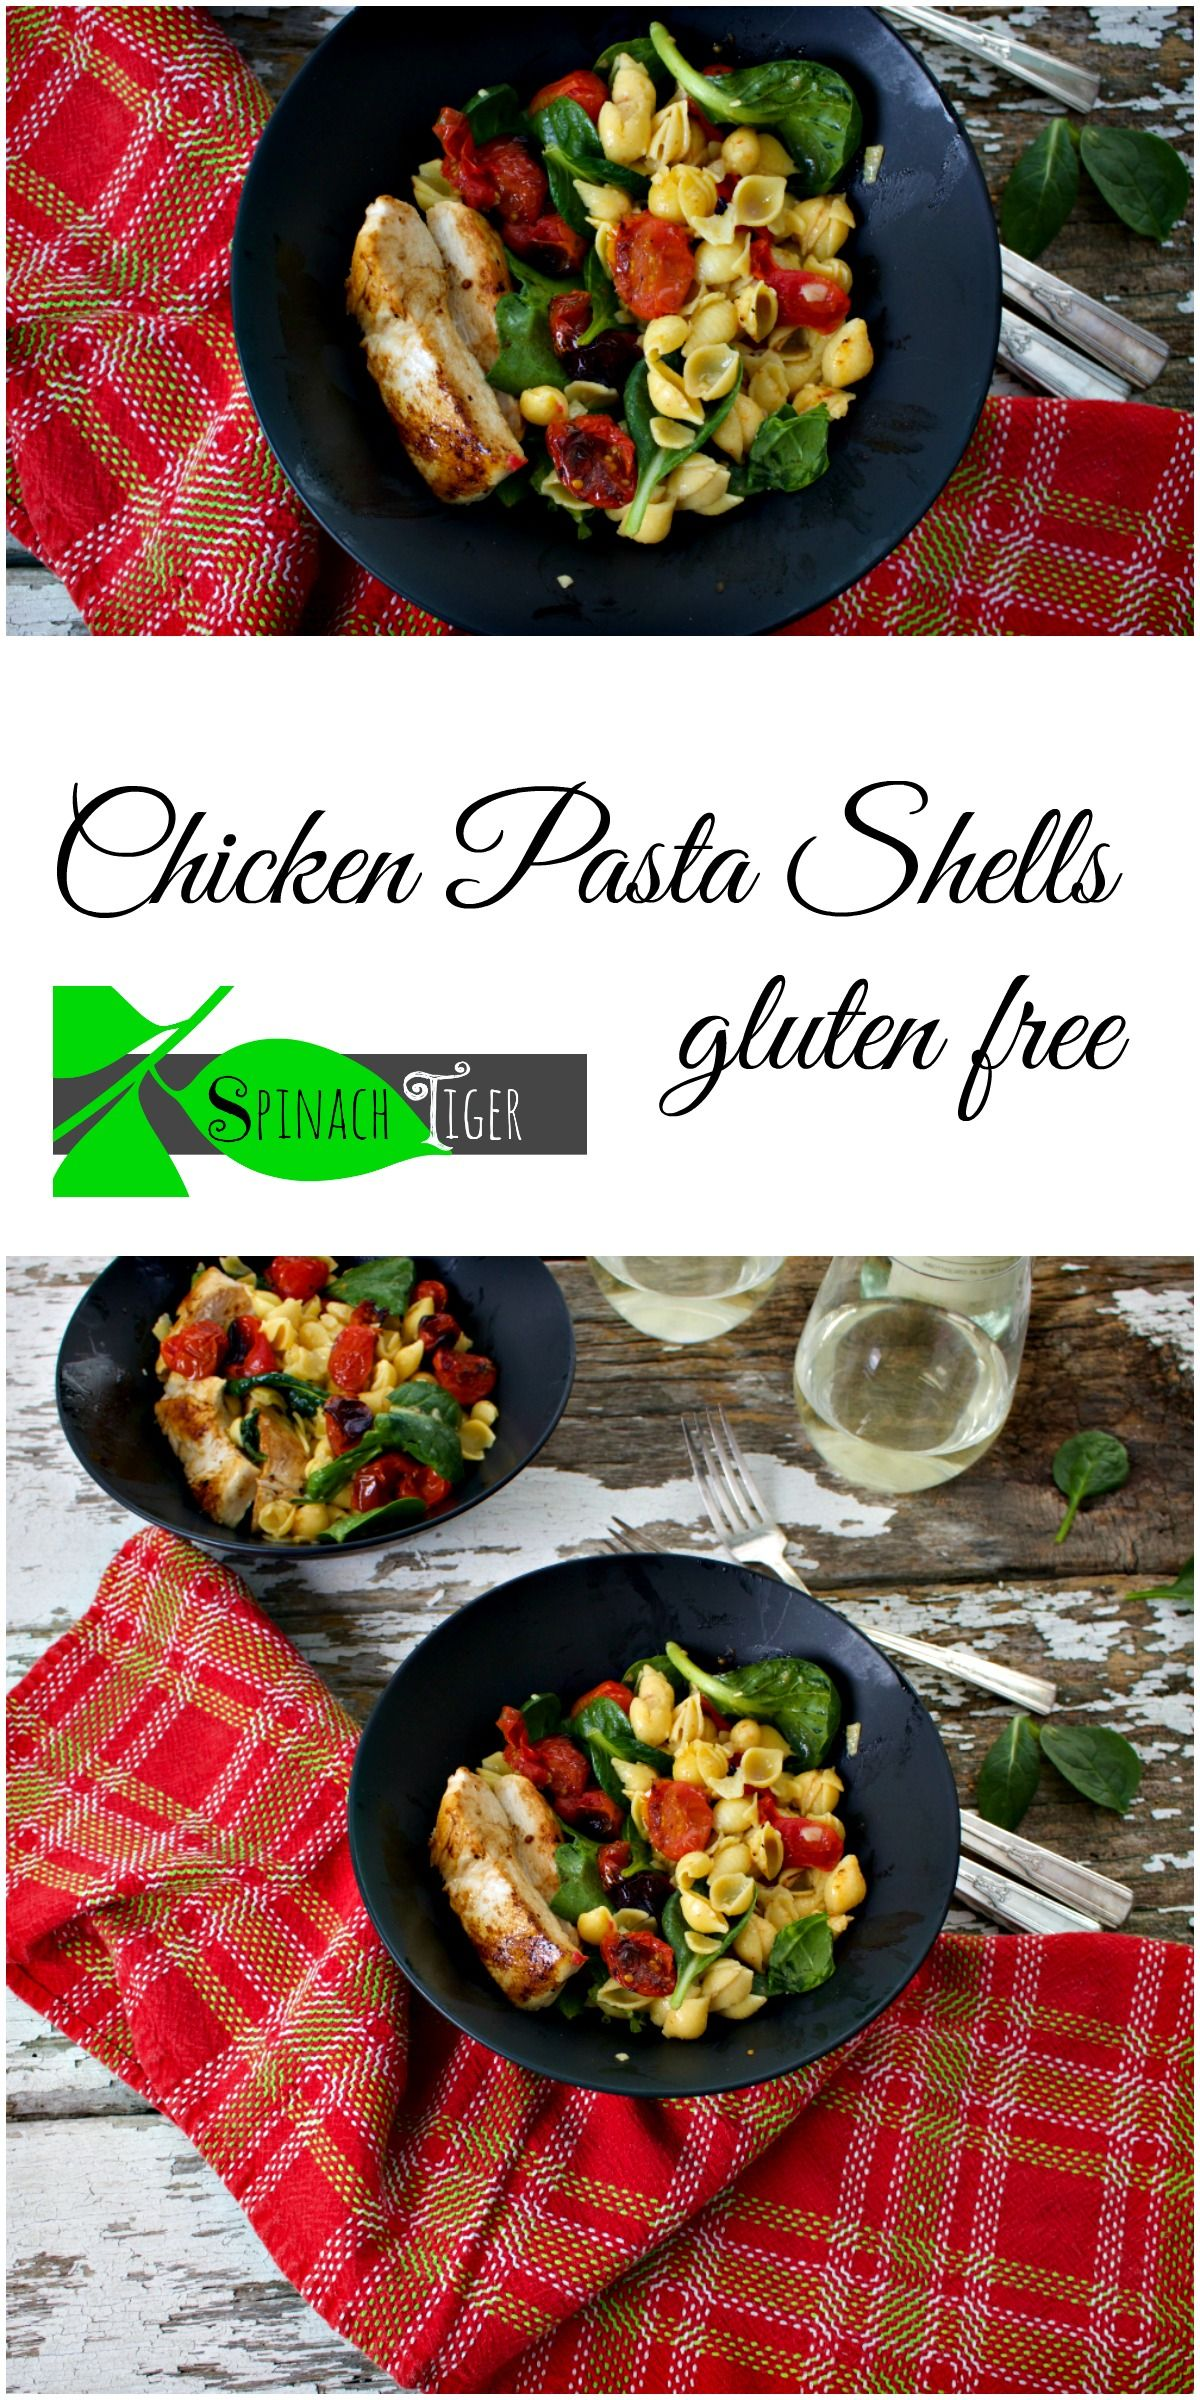 Park Art|My WordPress Blog_Gluten Free Pasta Shells To Stuff